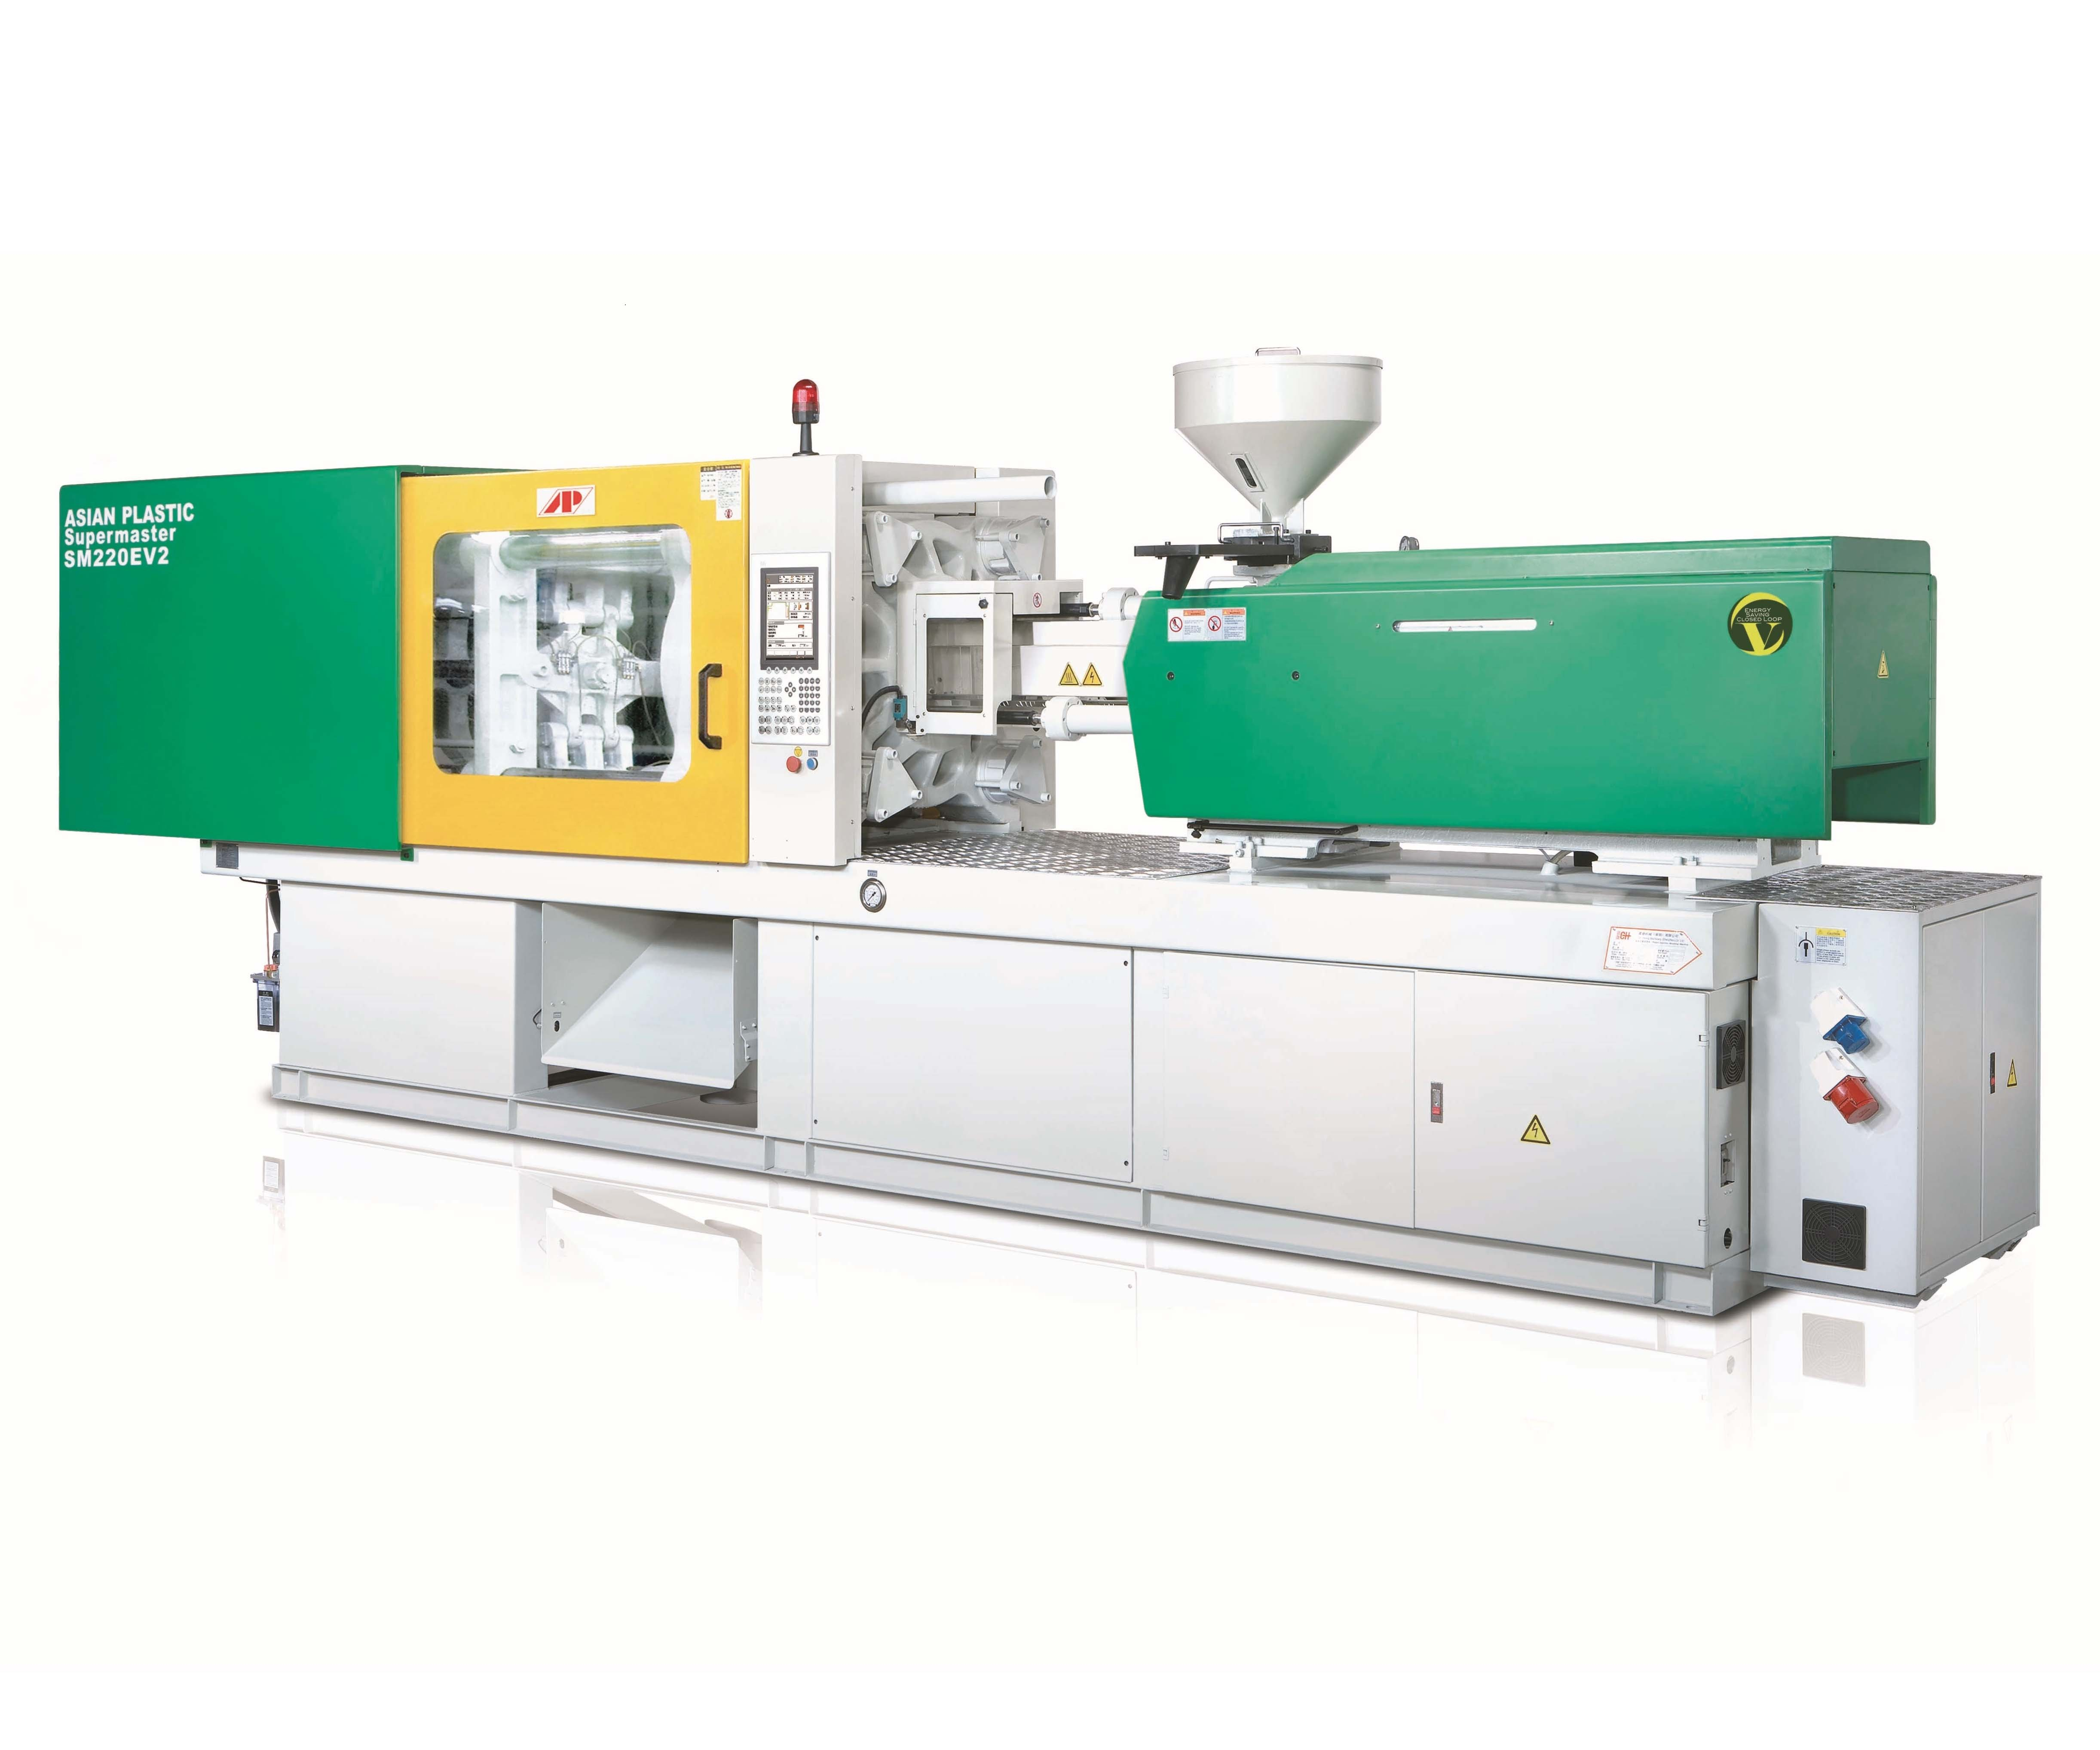 Supermaster EV2 servo-hydraulic toggle presses